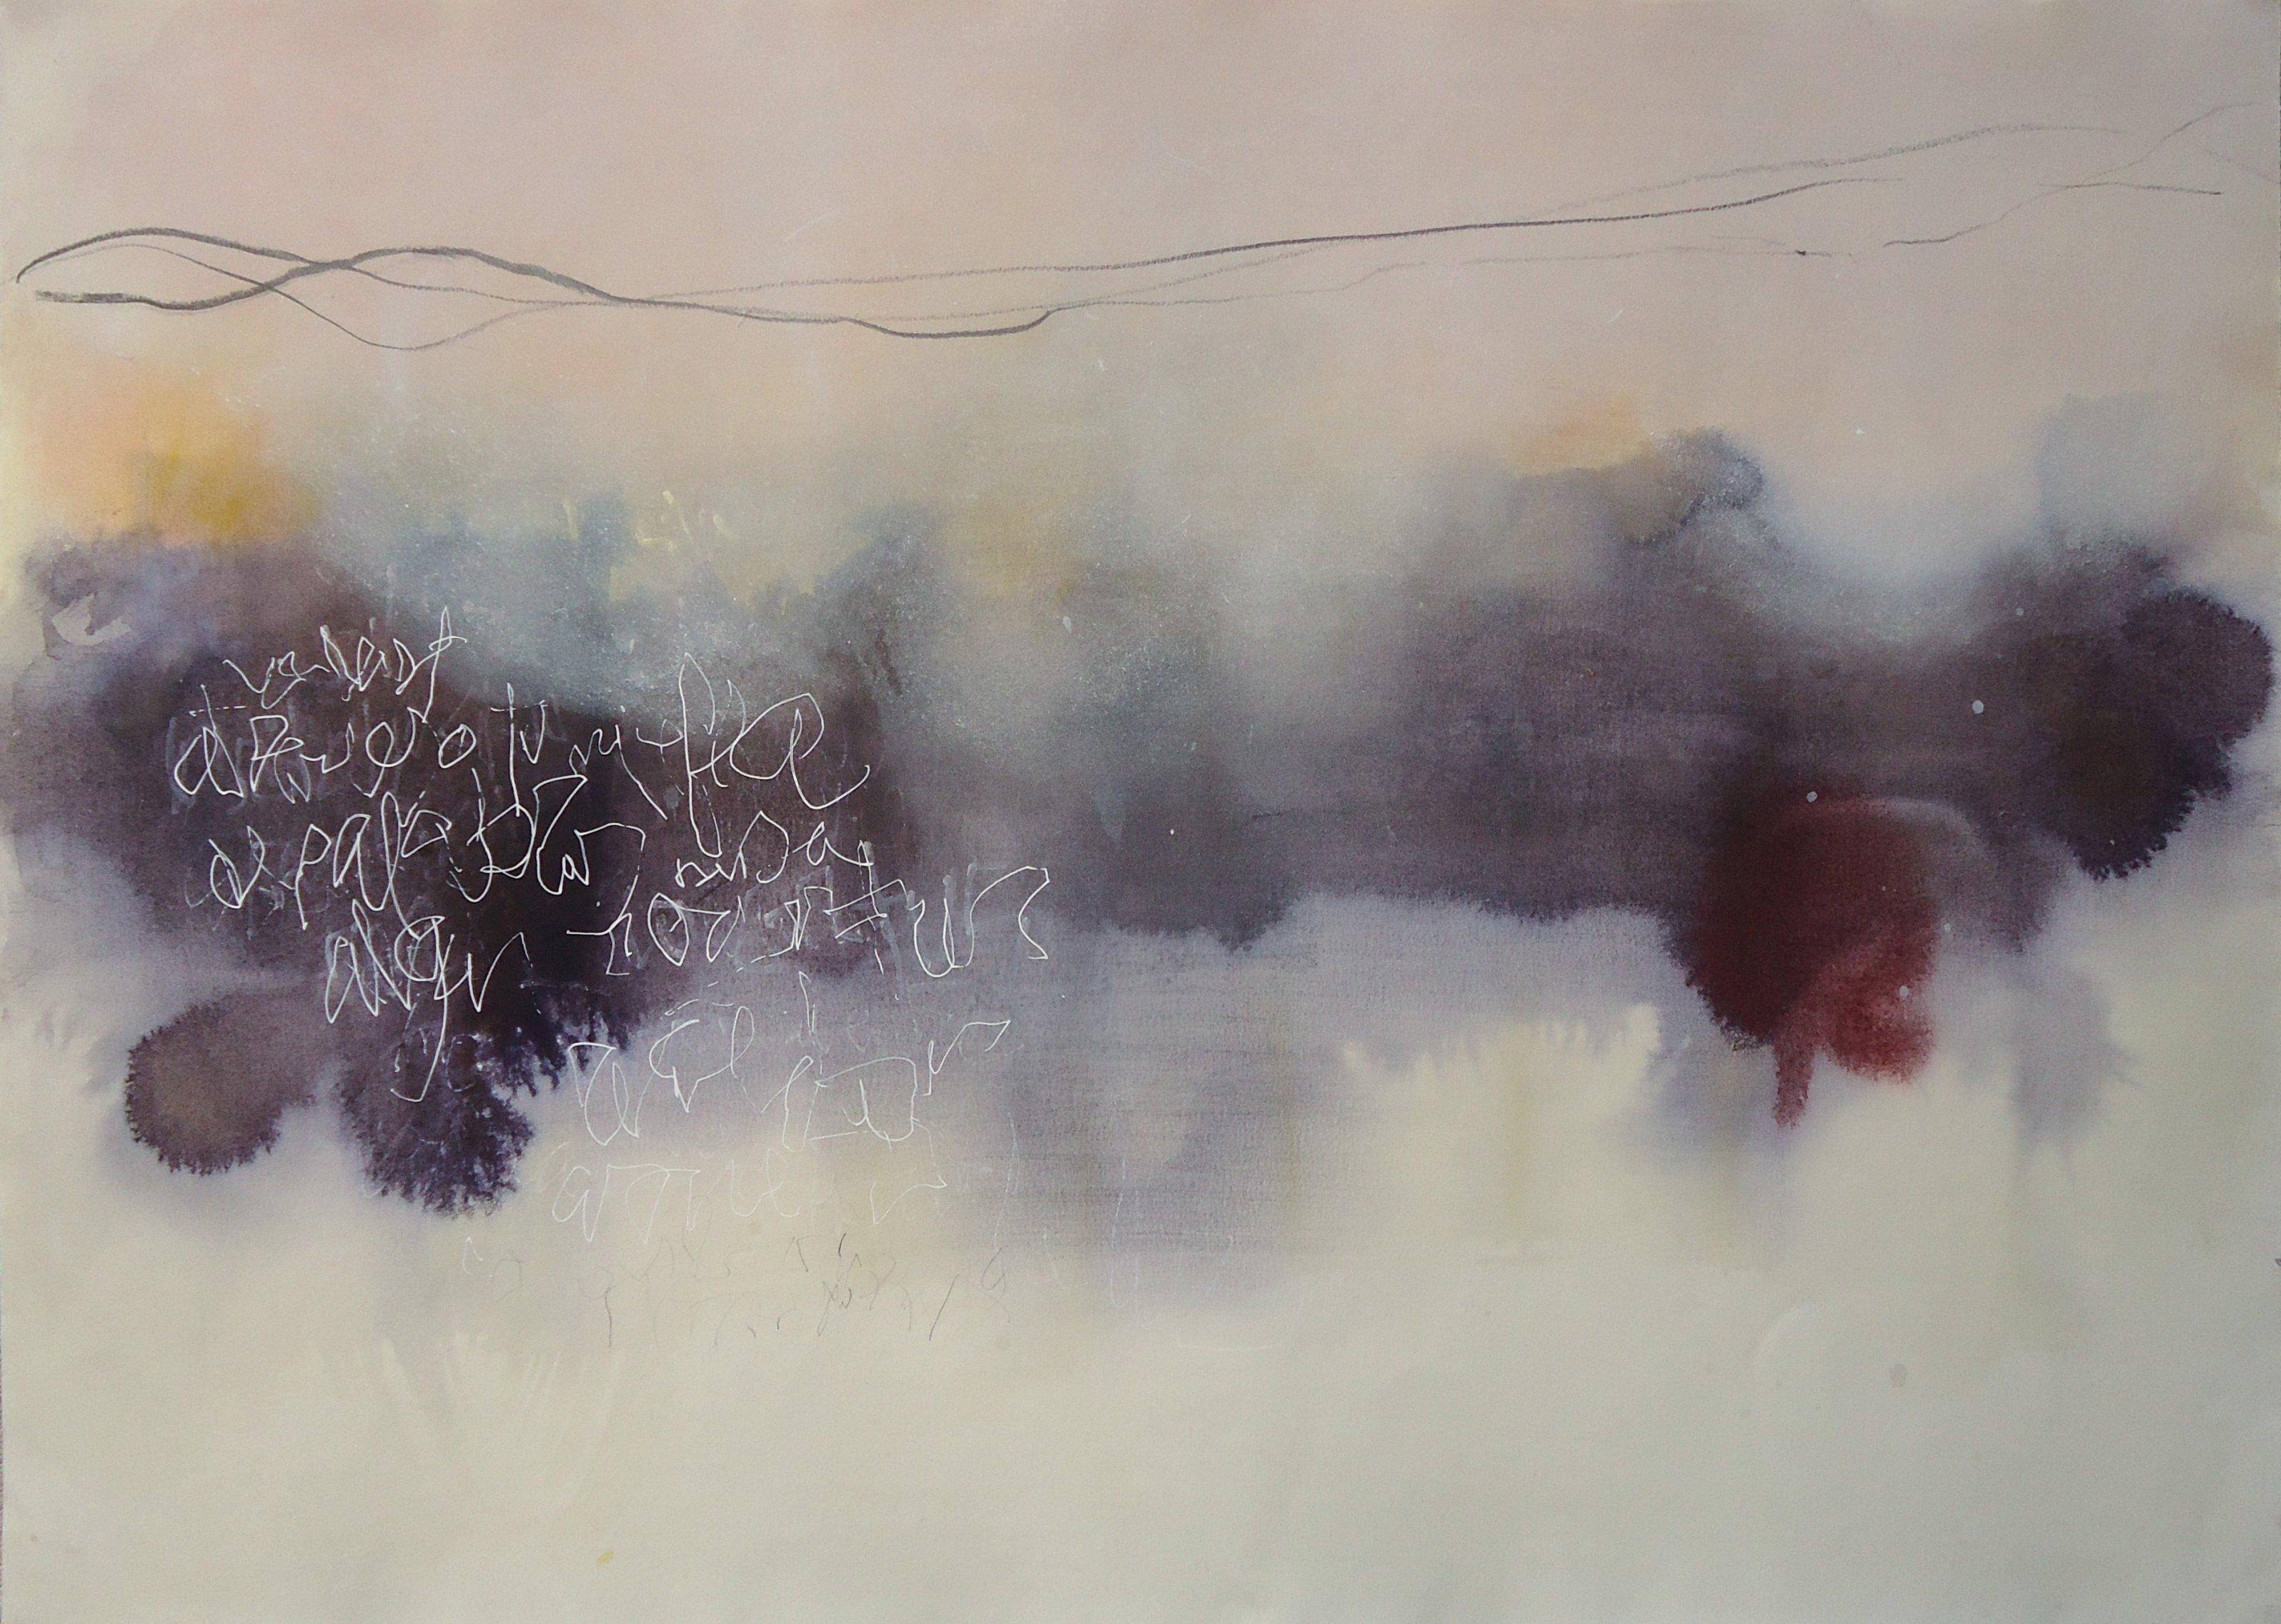 palabras pensadas (2015) - Montse Baqués